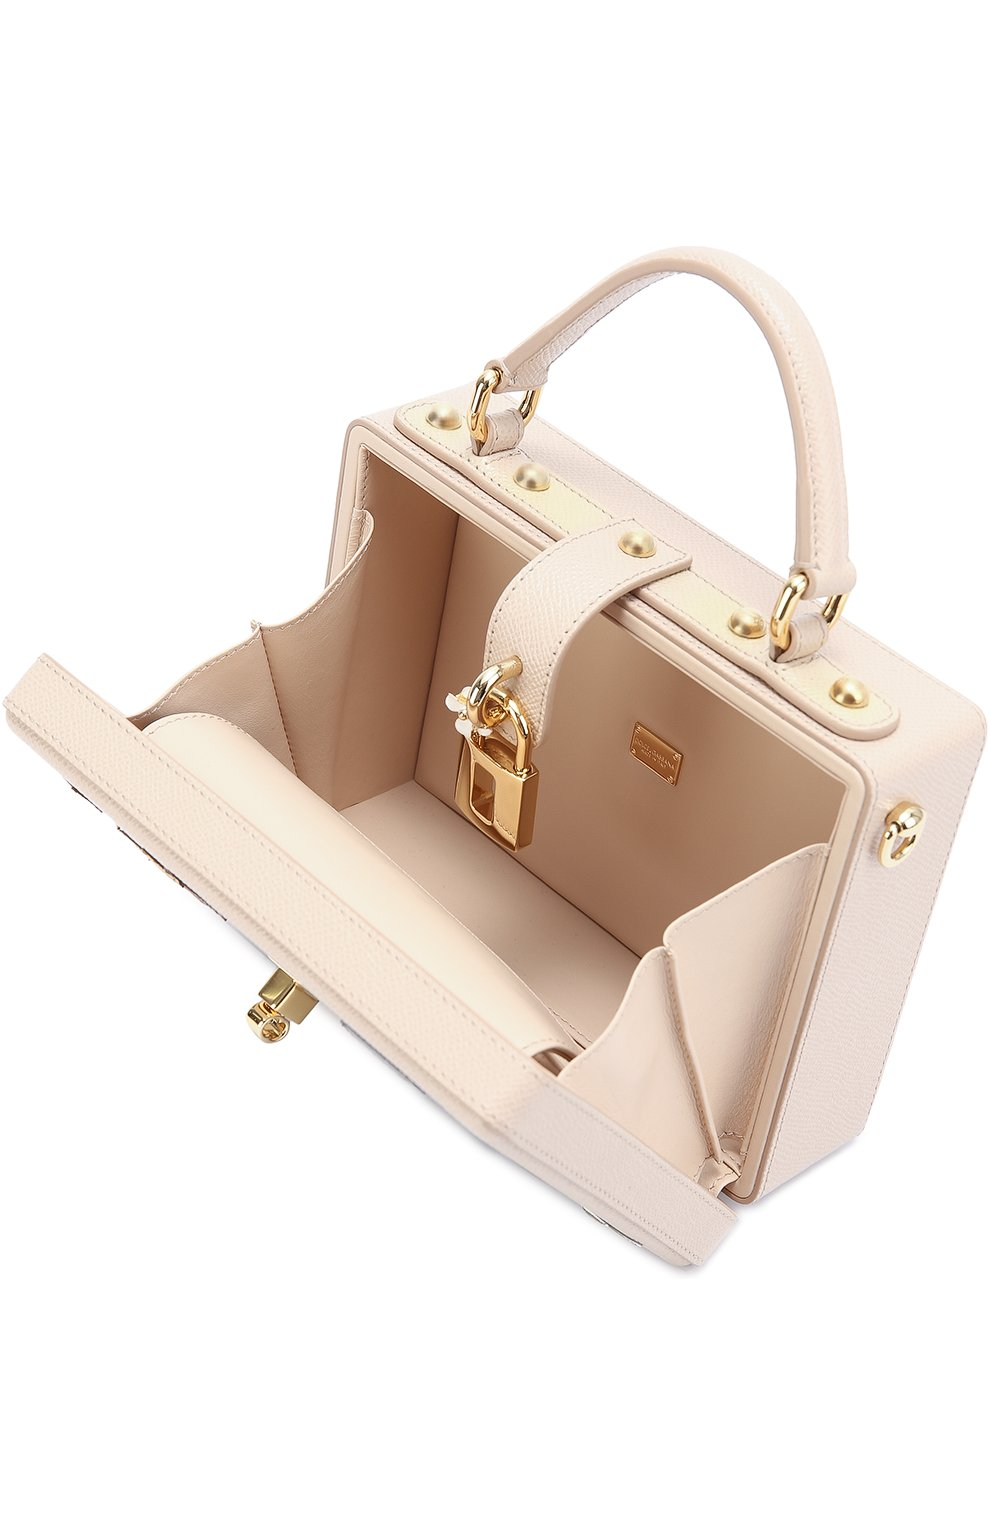 Сумка Dolce Box с аппликацией DG Family Dolce & Gabbana розовая цвета   Фото №4